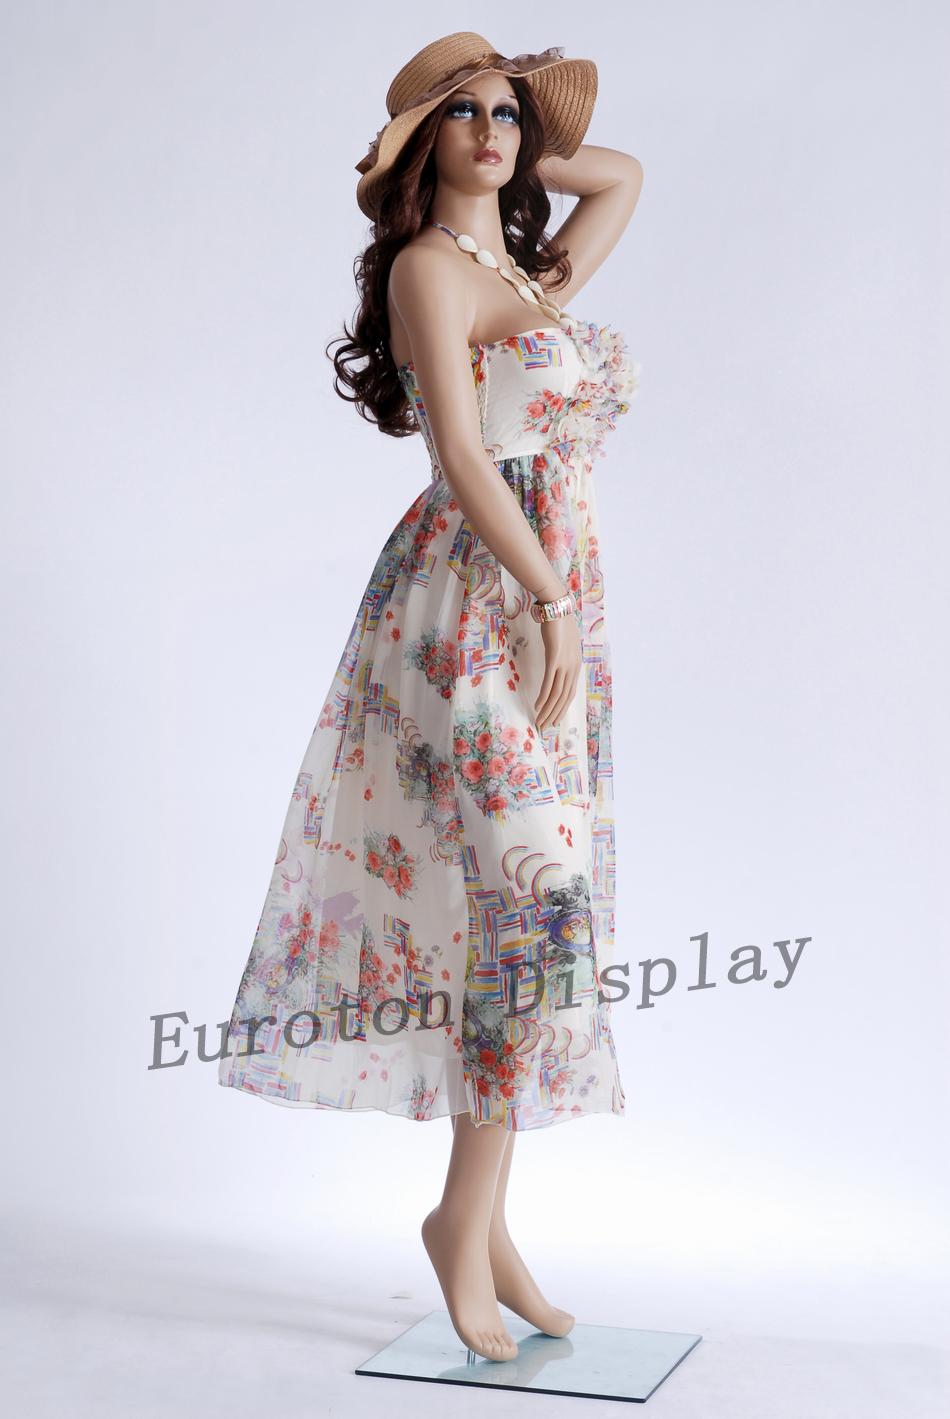 Sexy 3 Eurotondisplay Mannequin Femme 2014 | eBay